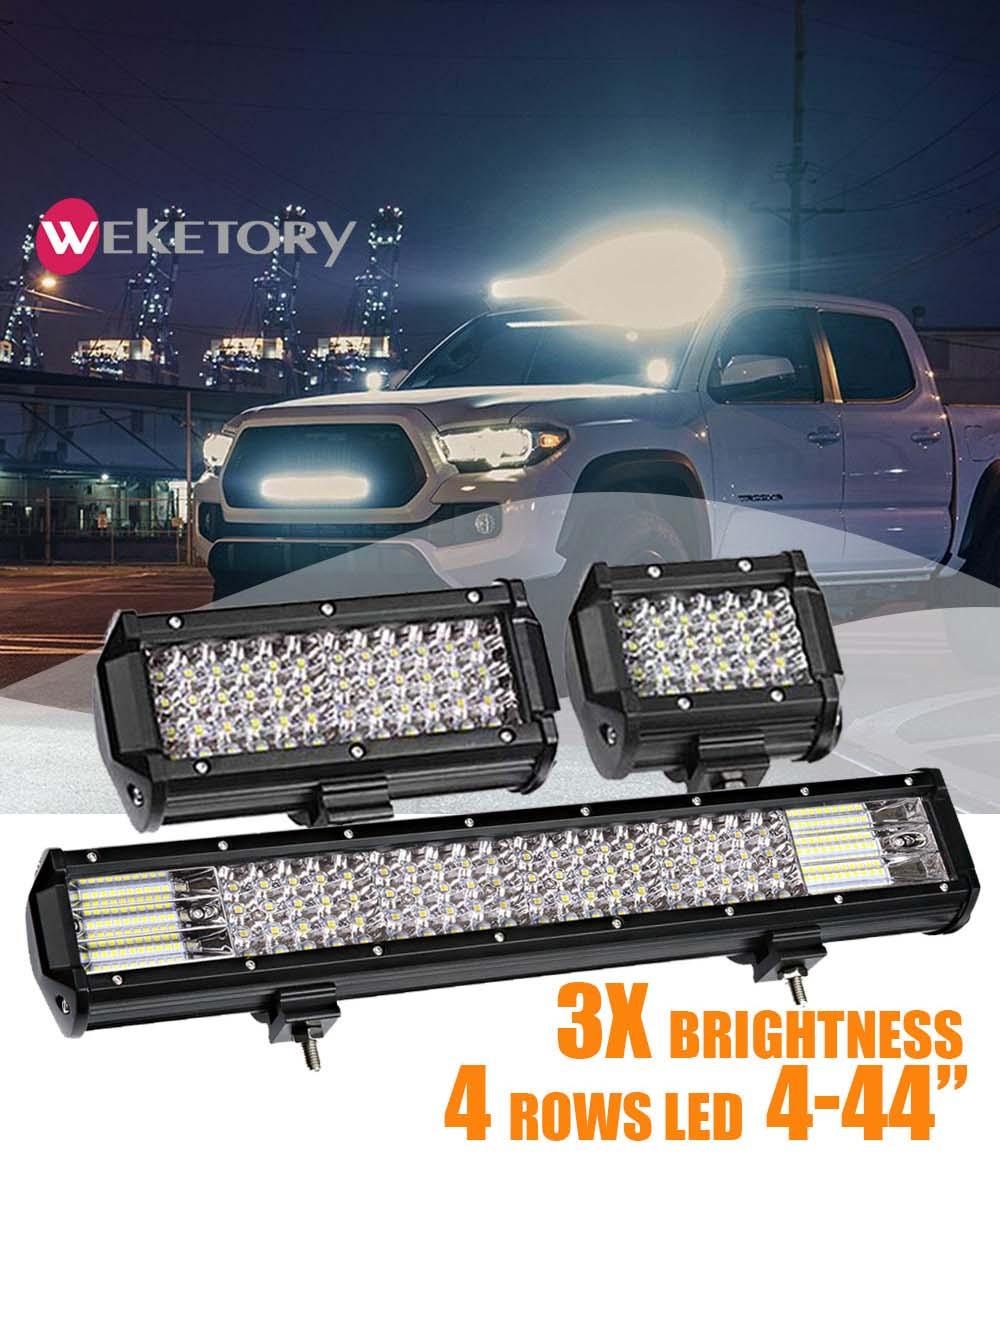 Led Bar Lights For Trucks   Weketory Quad Rows 4   44 Inch LED Bar LED Light Bar For Car Tractor Boat OffRoad Off Road 4WD 4×4 Truck SUV ATV Driving 12V 24V